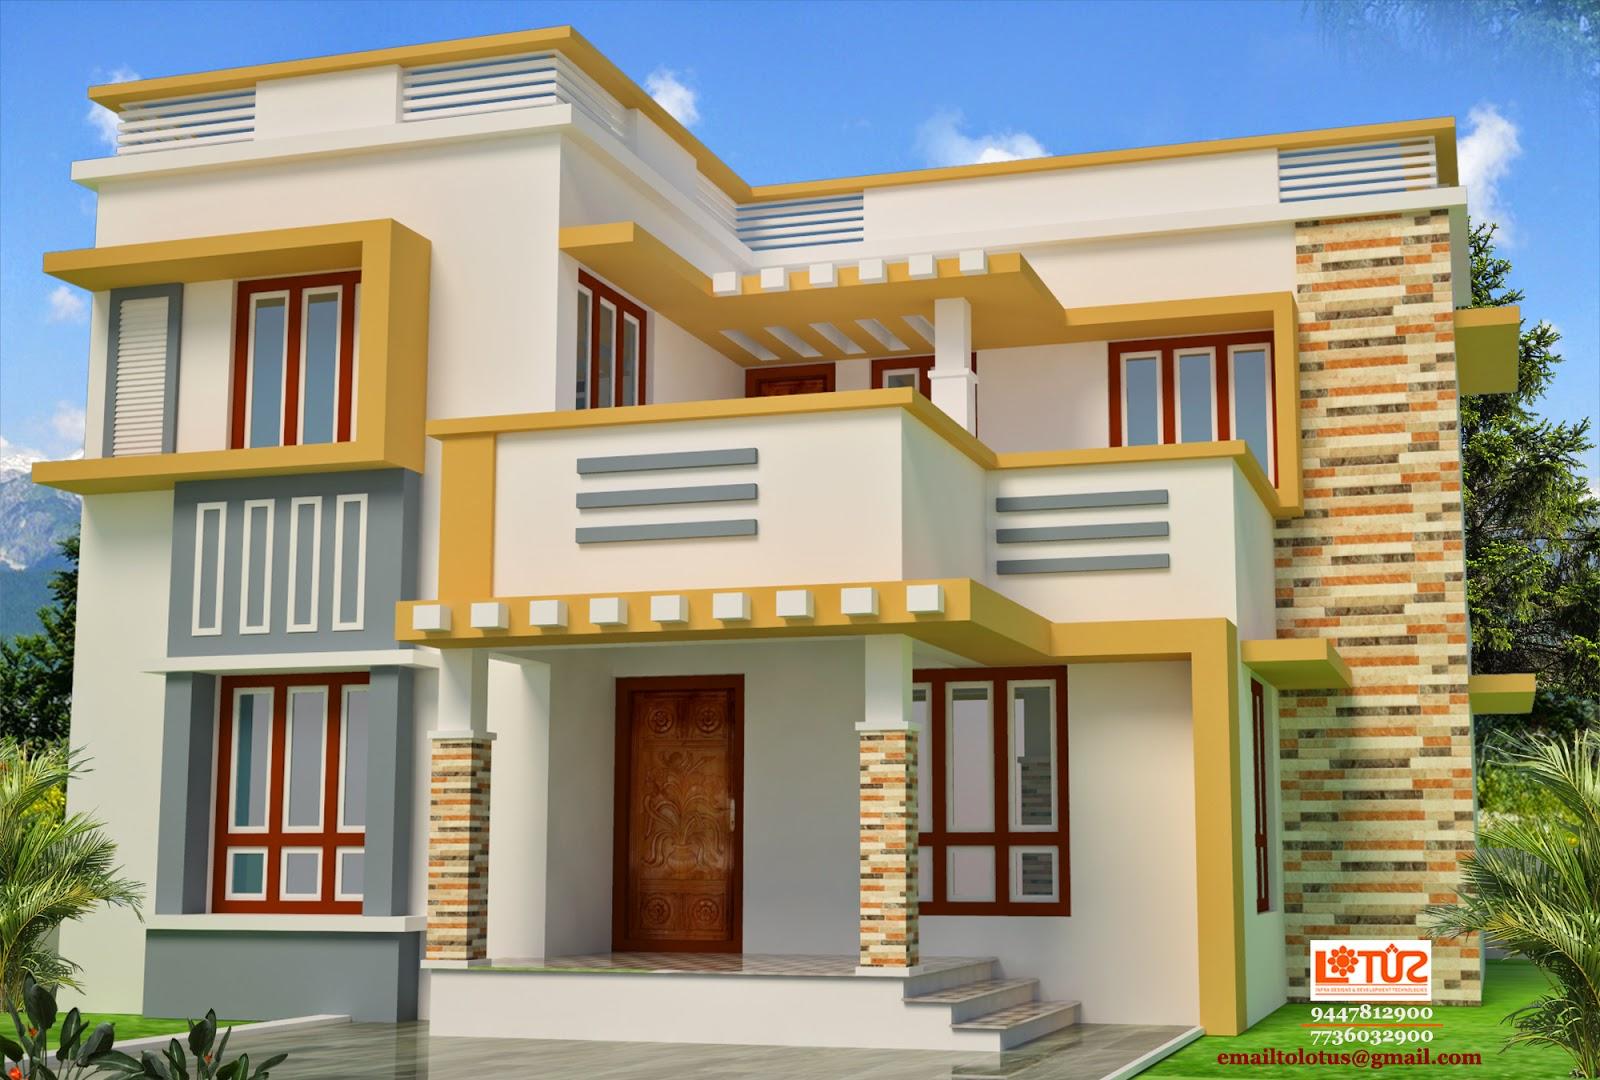 Veedu designs kerala modern home deasgn for Veedu design kerala